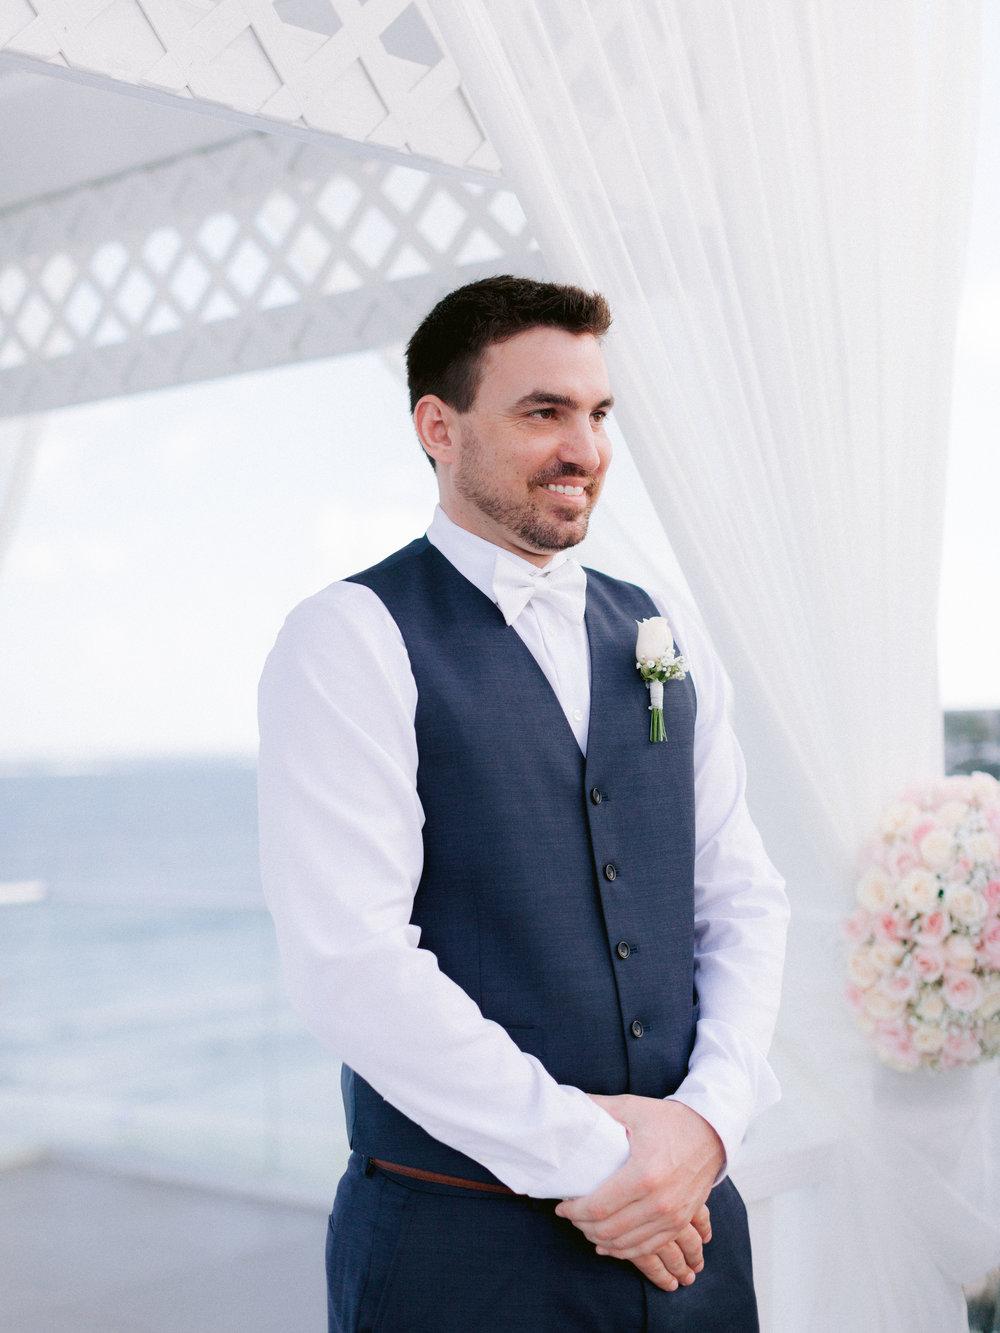 Kim_Jeff_Cancun Wedding_Ceremony_Kurtz_Orpia (35 of 119).jpg